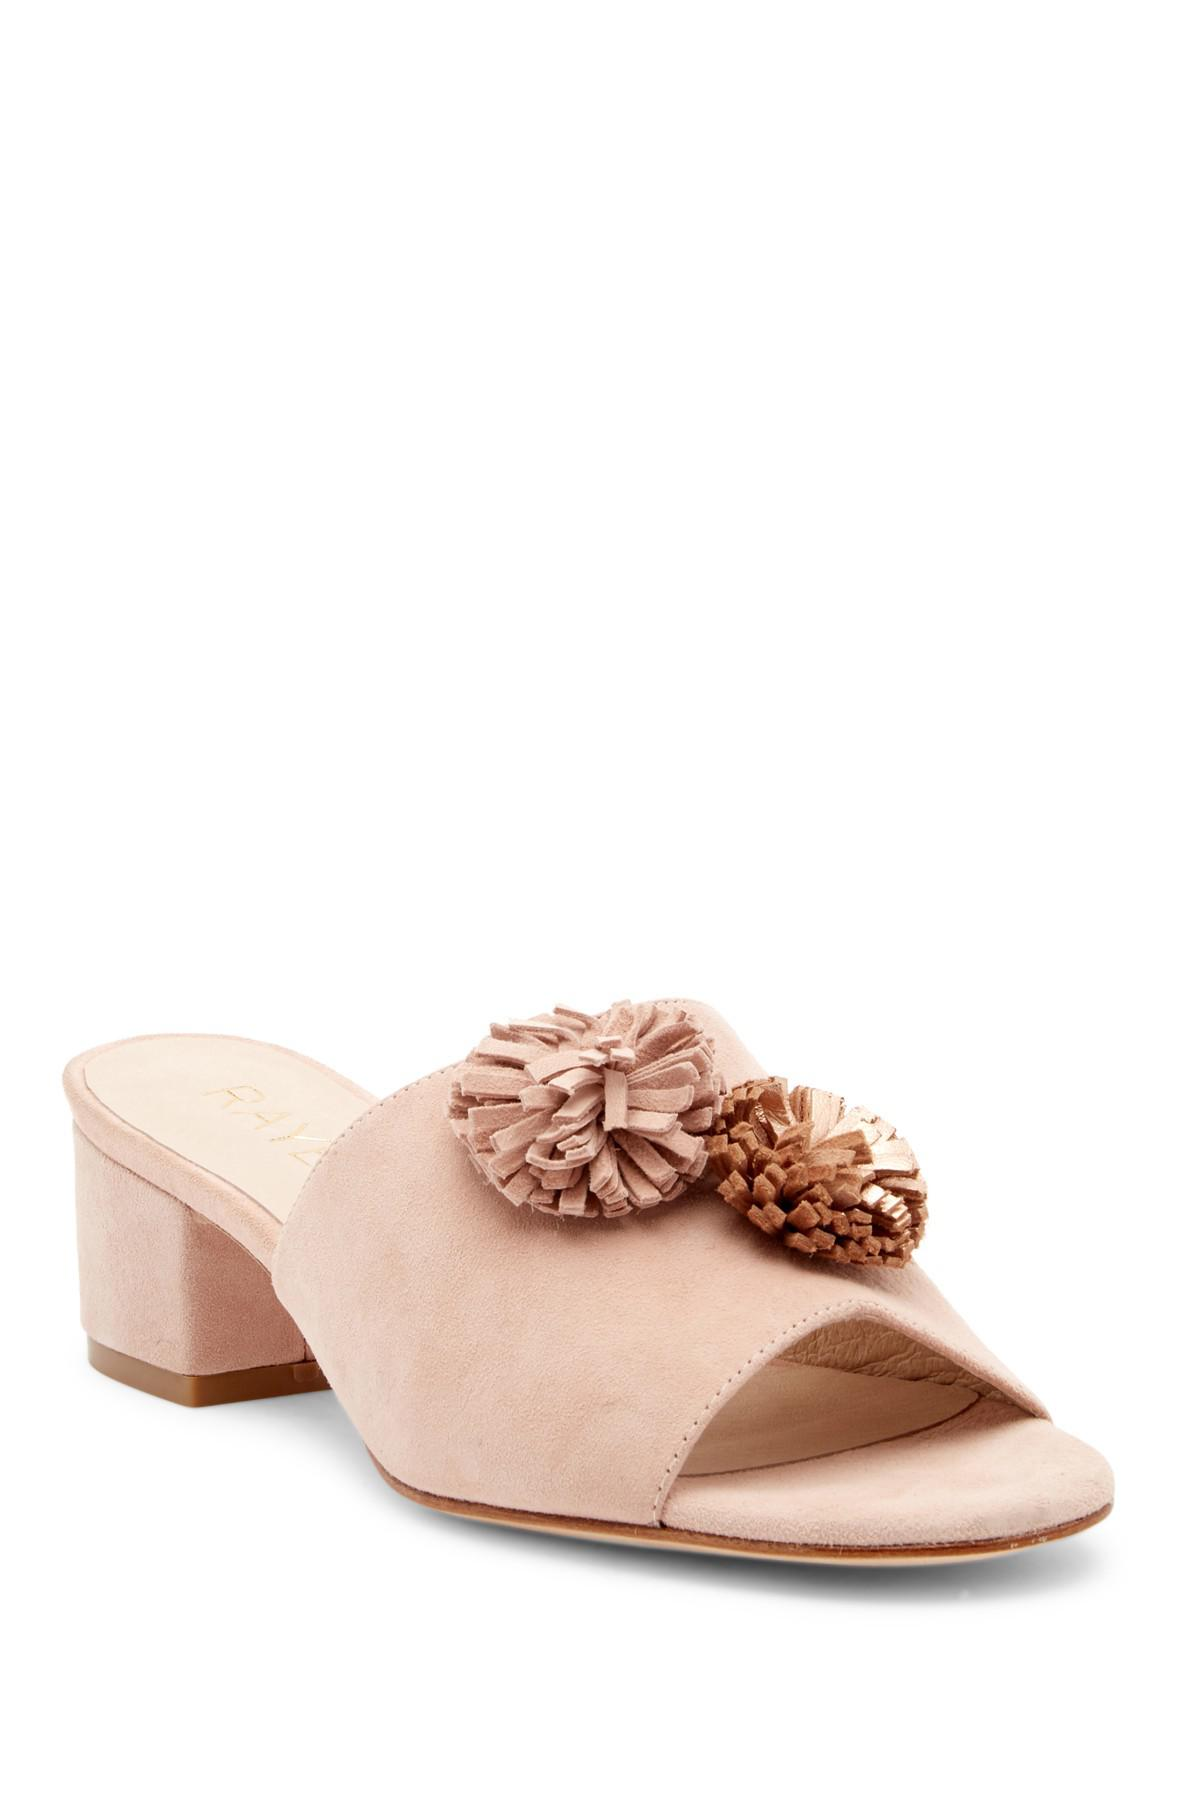 RAYE Chrissy Suede Pompom Sandal XWK1U